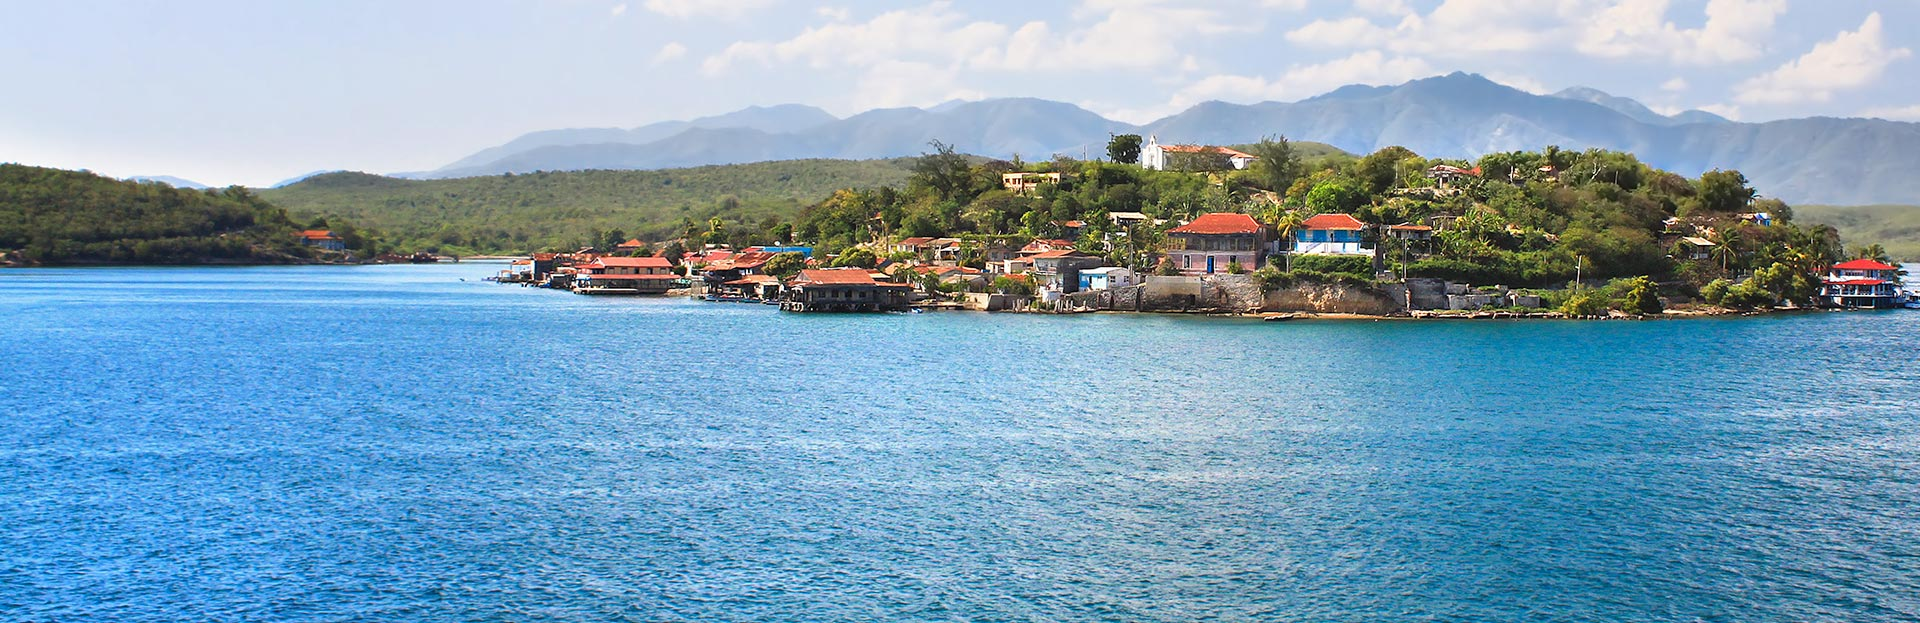 All Inclusive Vacations To Santiago De Cuba Tripcentral Ca